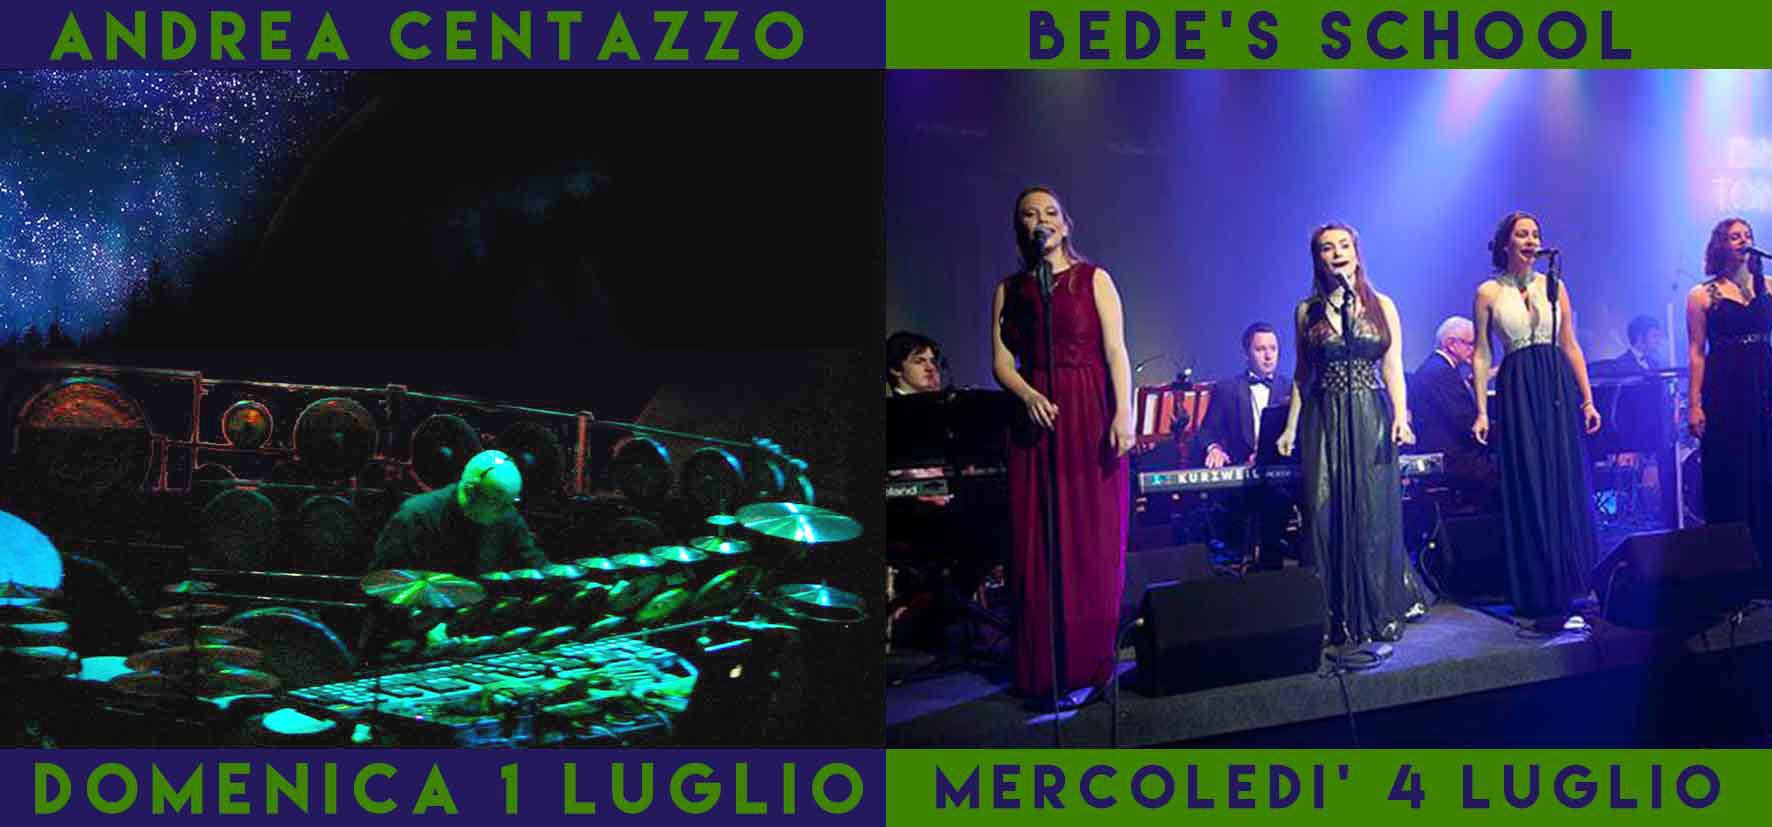 Andrea Centazzo - Bede's School